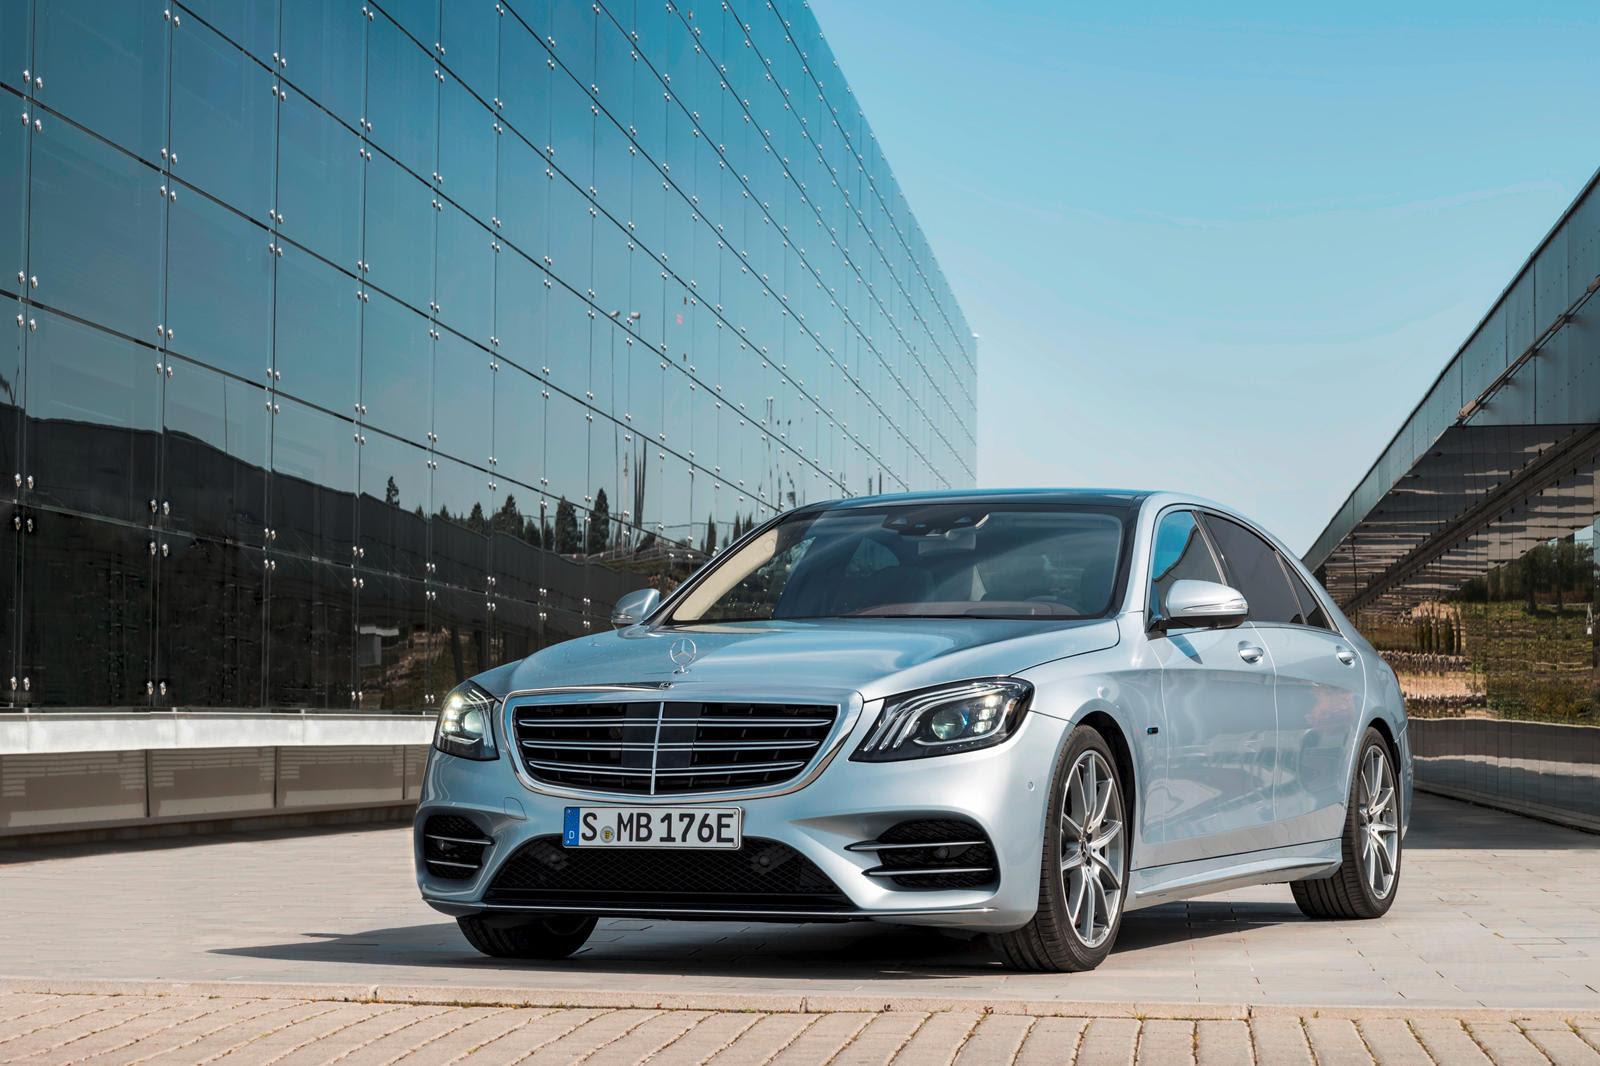 2020 Mercedes-Benz S-Class Hybrid: Review, Trims, Specs, Price, New Interior Features, Exterior ...